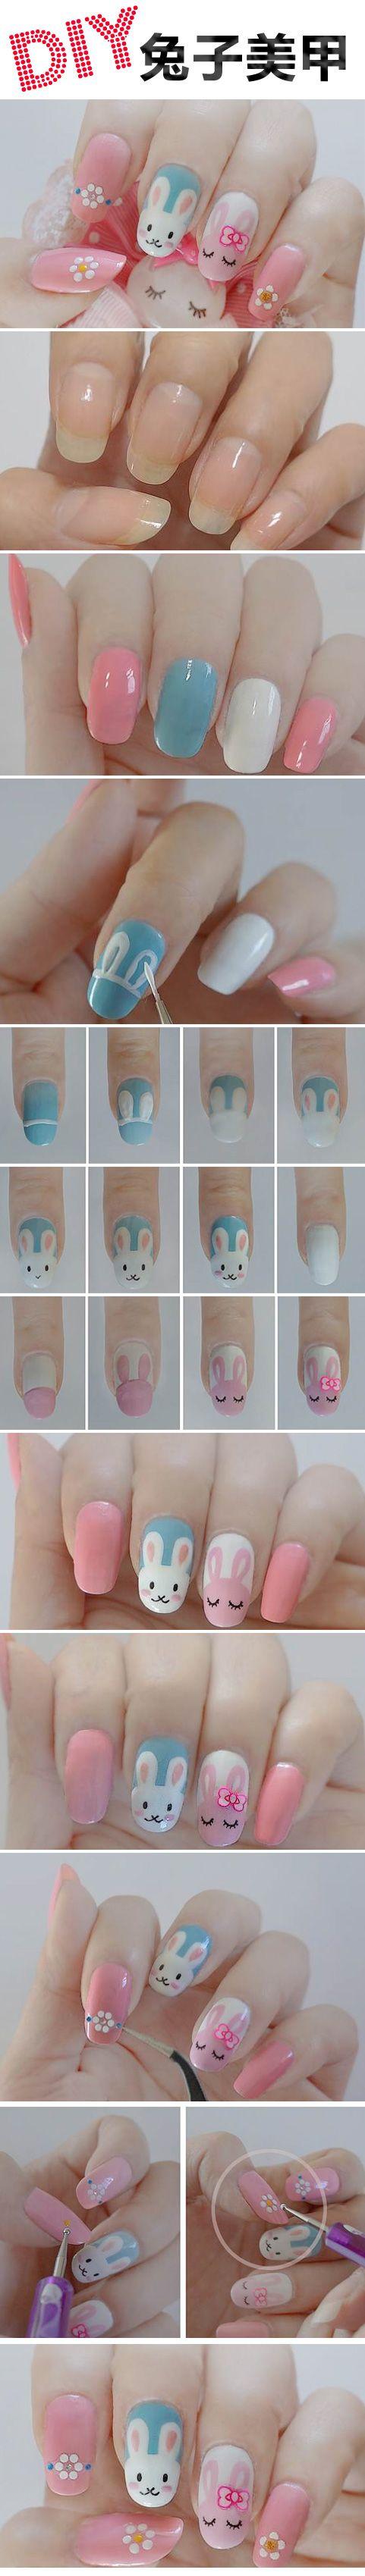 15 Amazing And Useful Nails Tutorials, DIY Cute Rabbit Nail Design